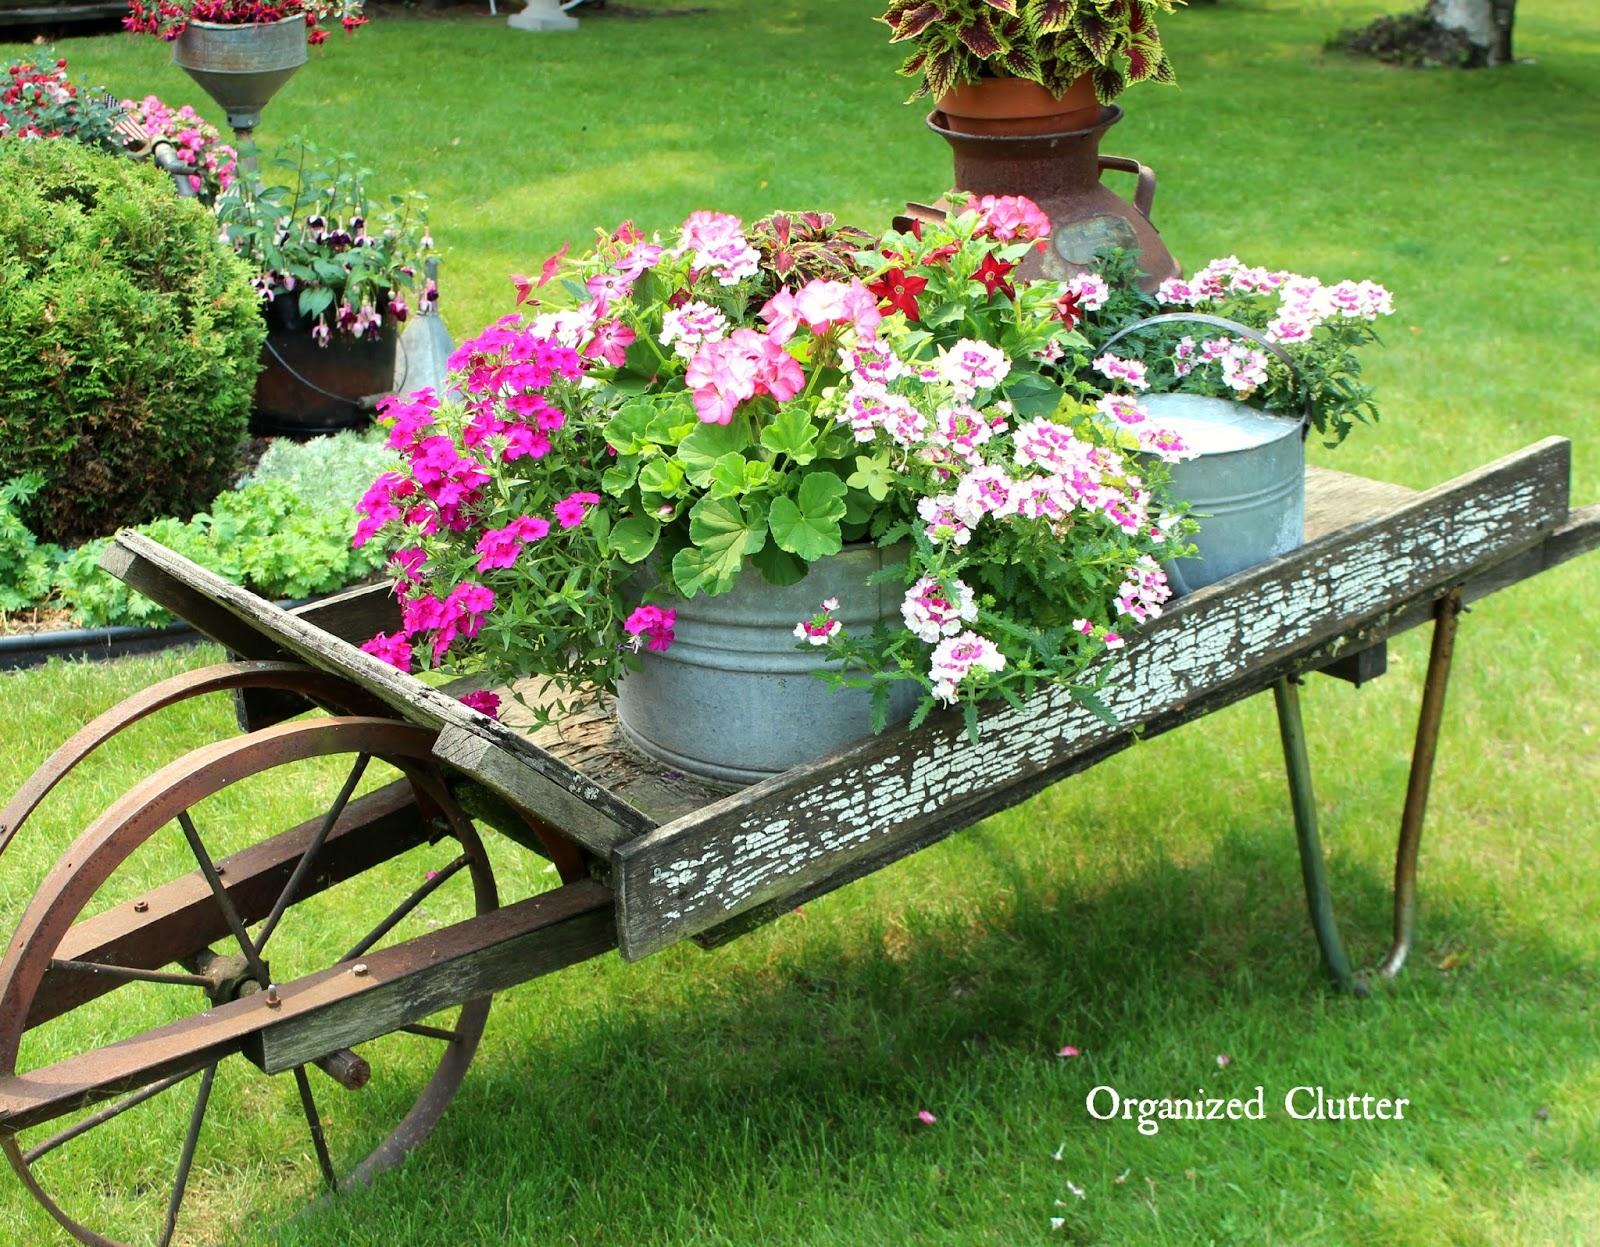 Rustic Garden Wheelbarrow 2015 | Organized Clutter on Rustic Backyard Ideas id=13275